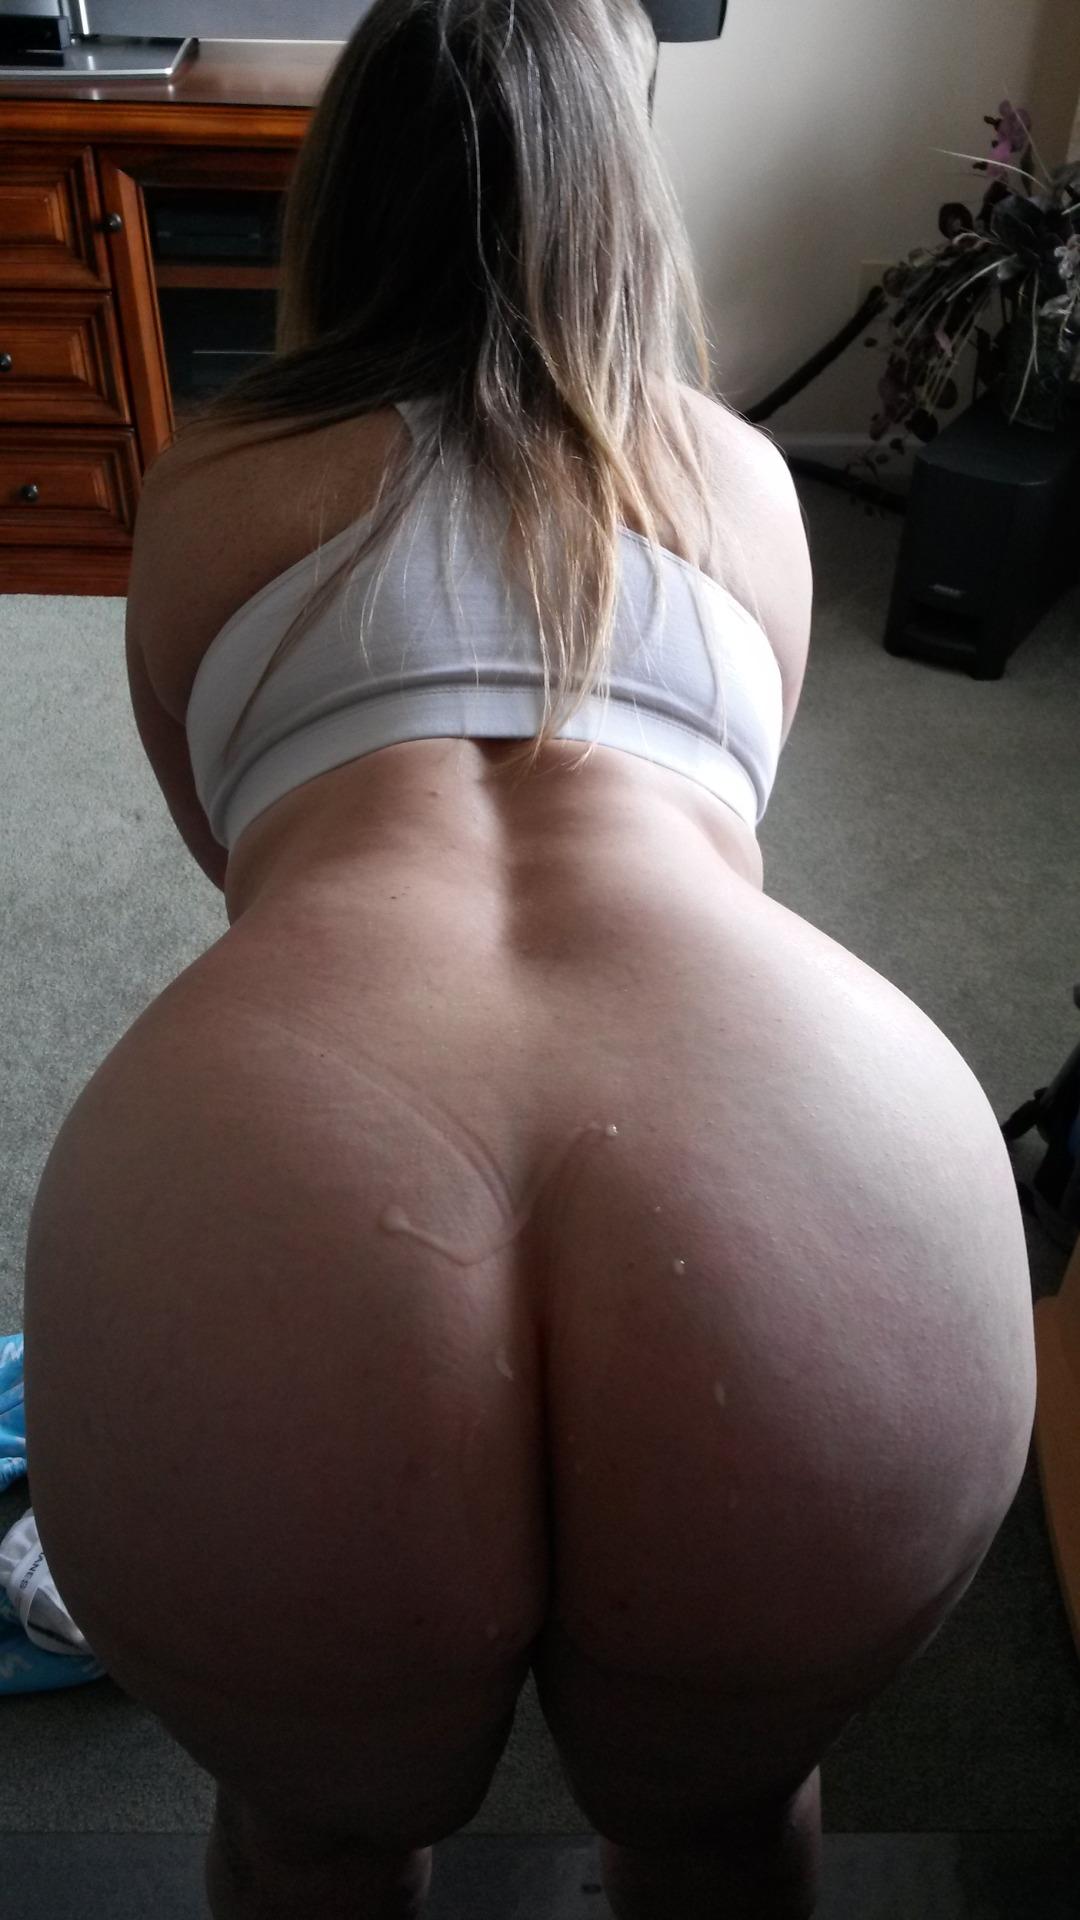 homemade mom son nude photo